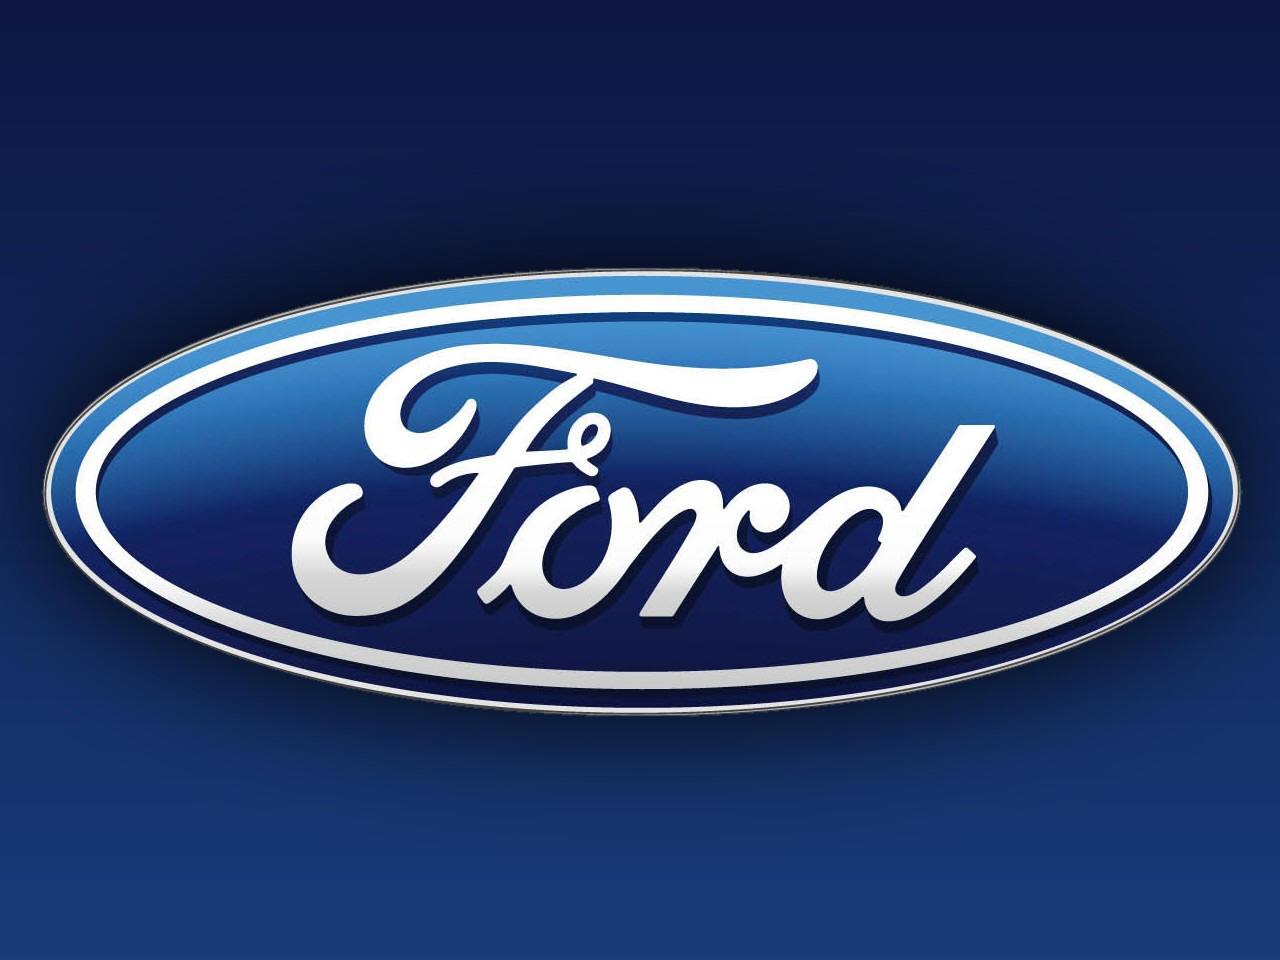 Ford Motor Company Meet & Greet